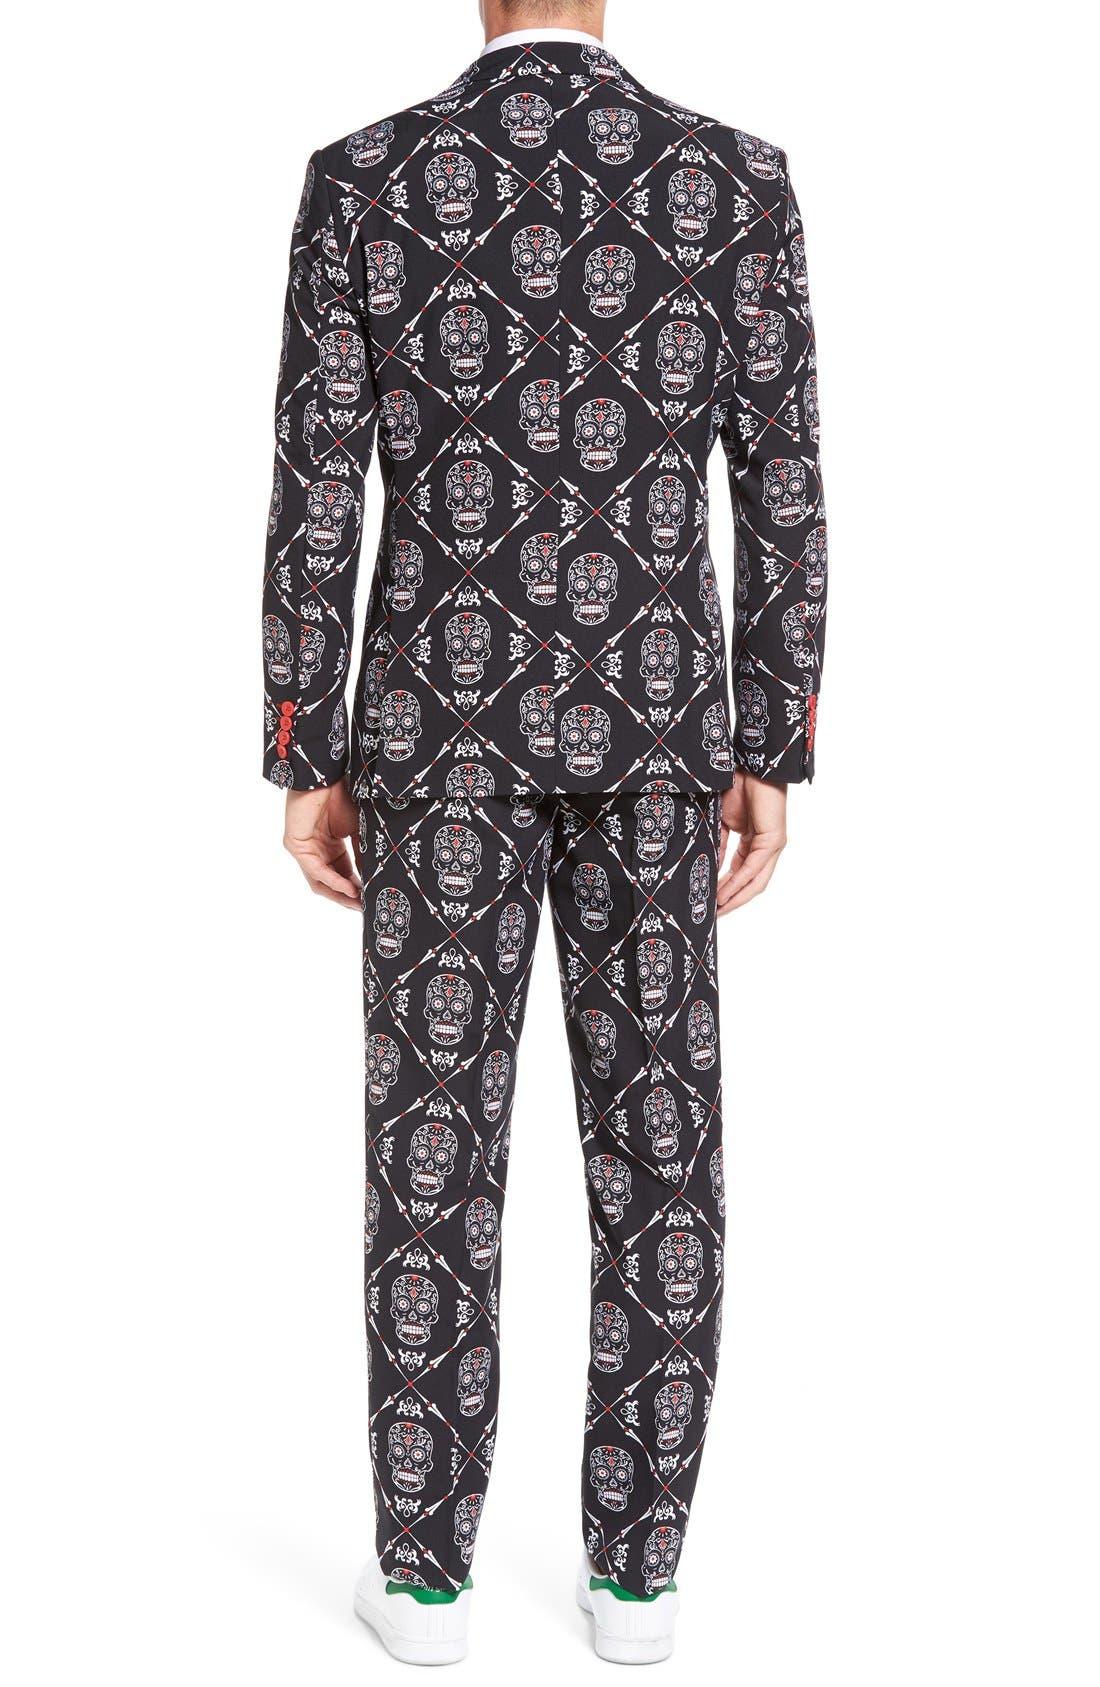 'Haunting Hombre' Trim Fit Suit with Tie,                             Alternate thumbnail 2, color,                             001